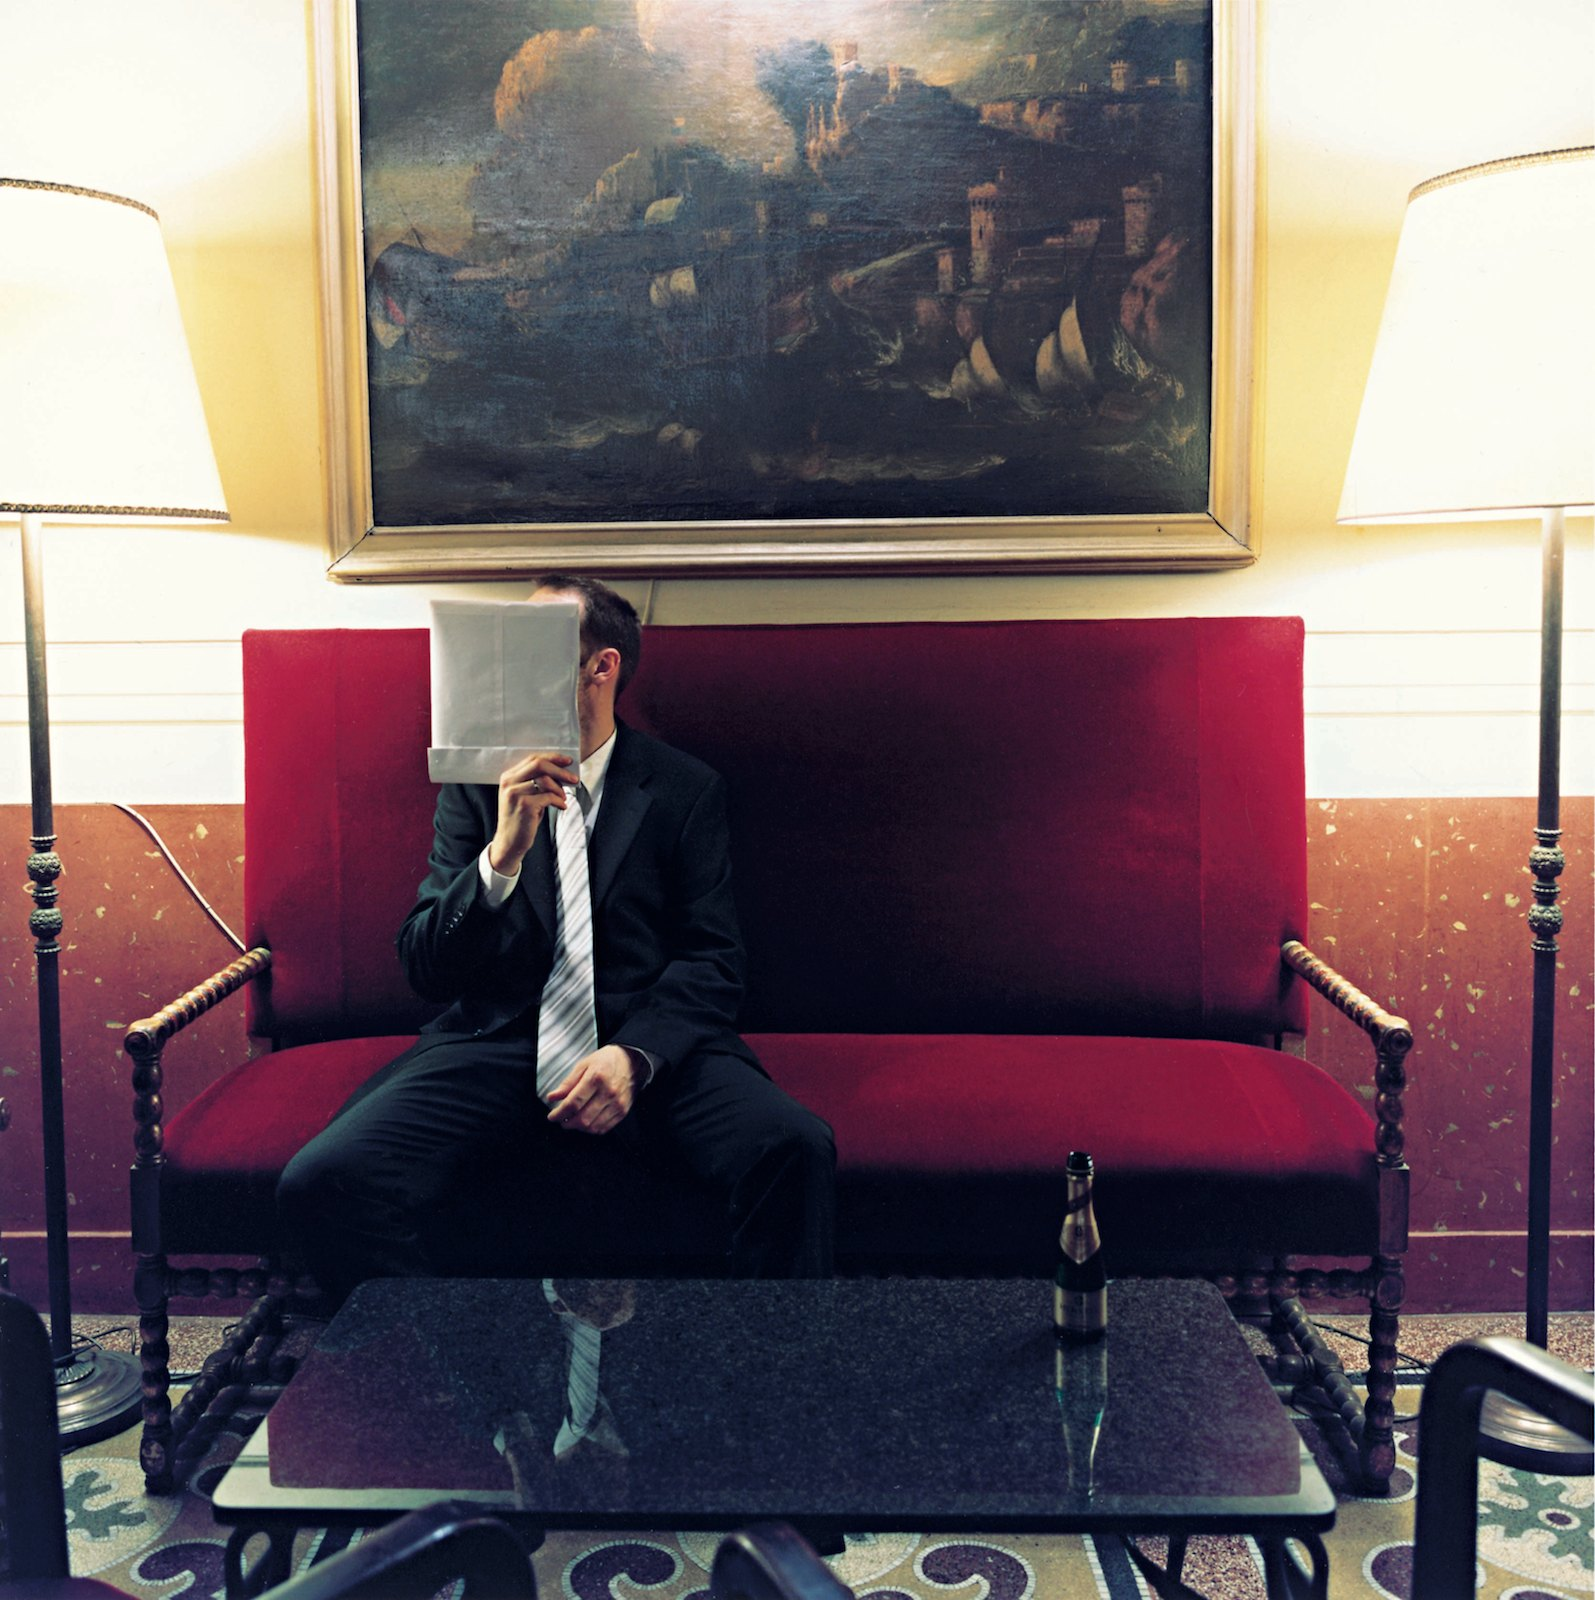 Hotel Grand Plaza 13:34, 2008, C-print, 65 x 65 cm